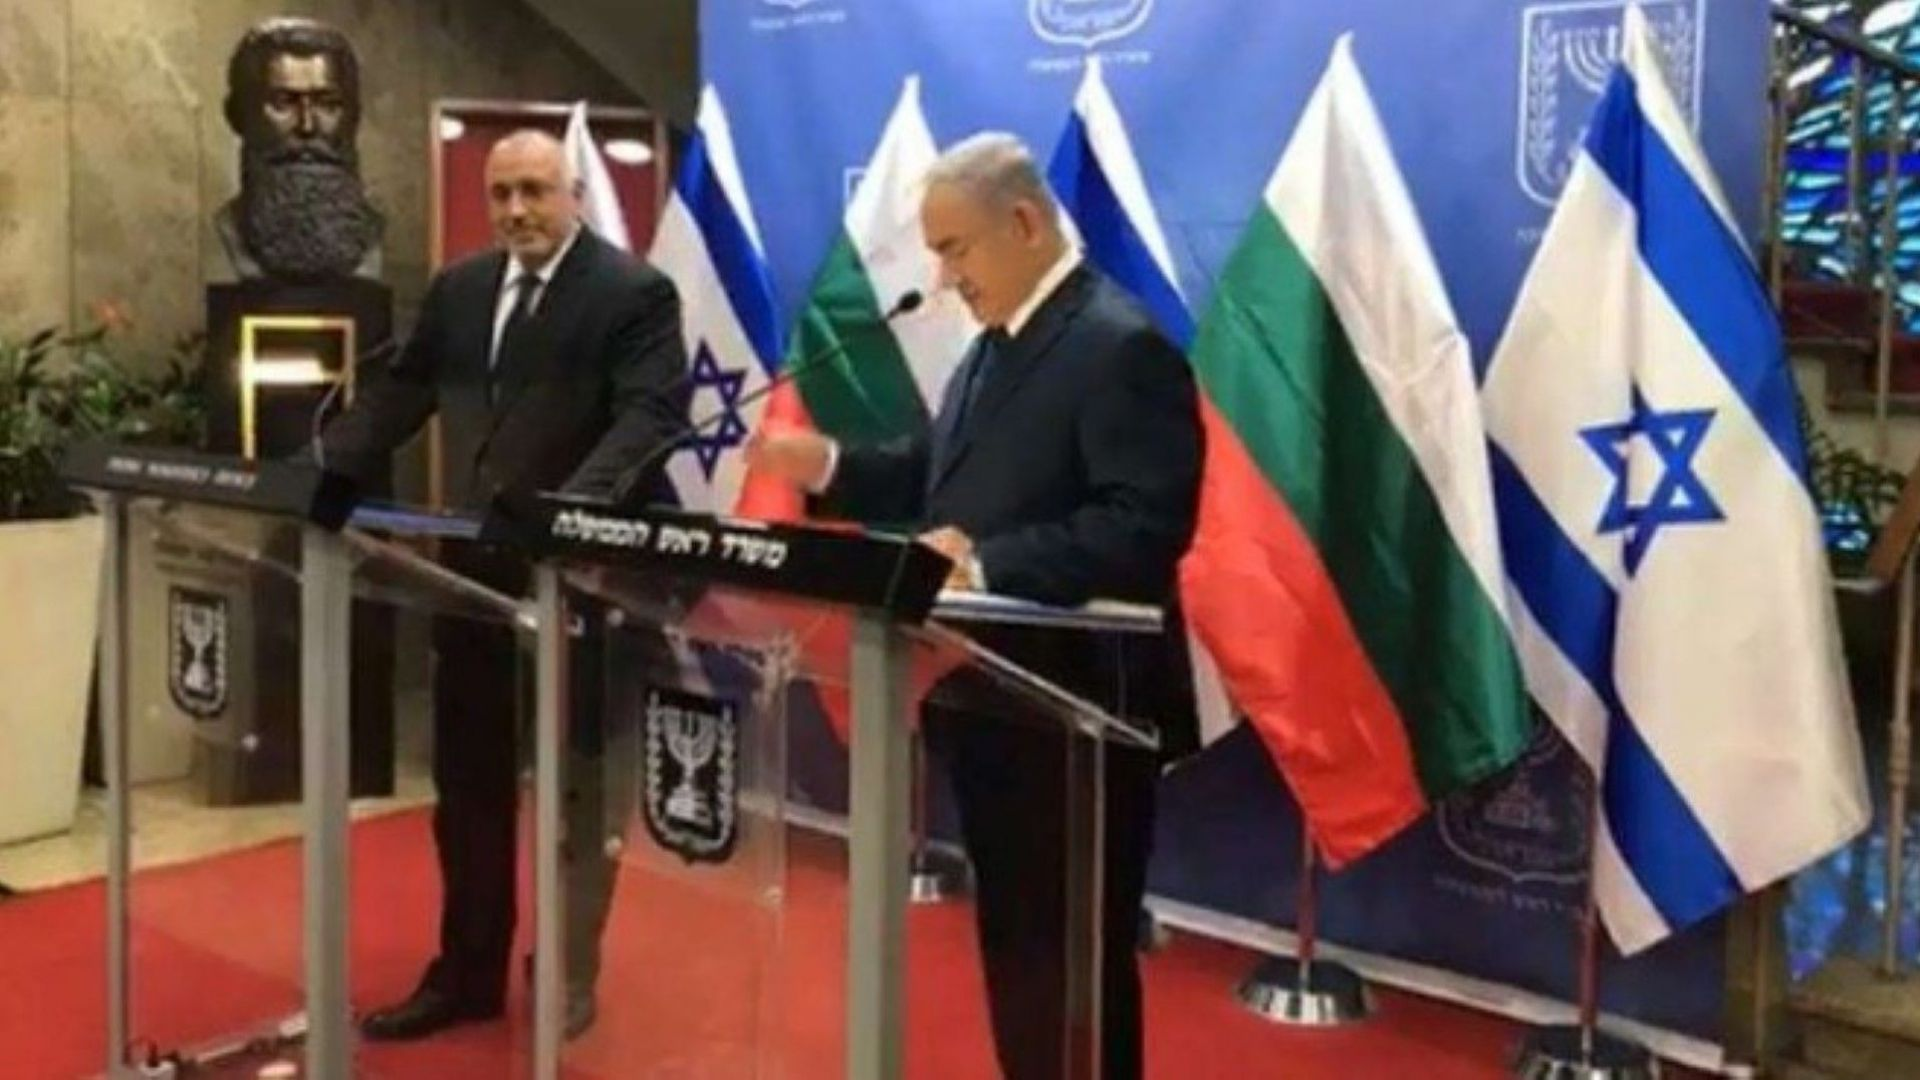 Поех ангажимент за генерално консулство за цял Израел в Йерусалим,